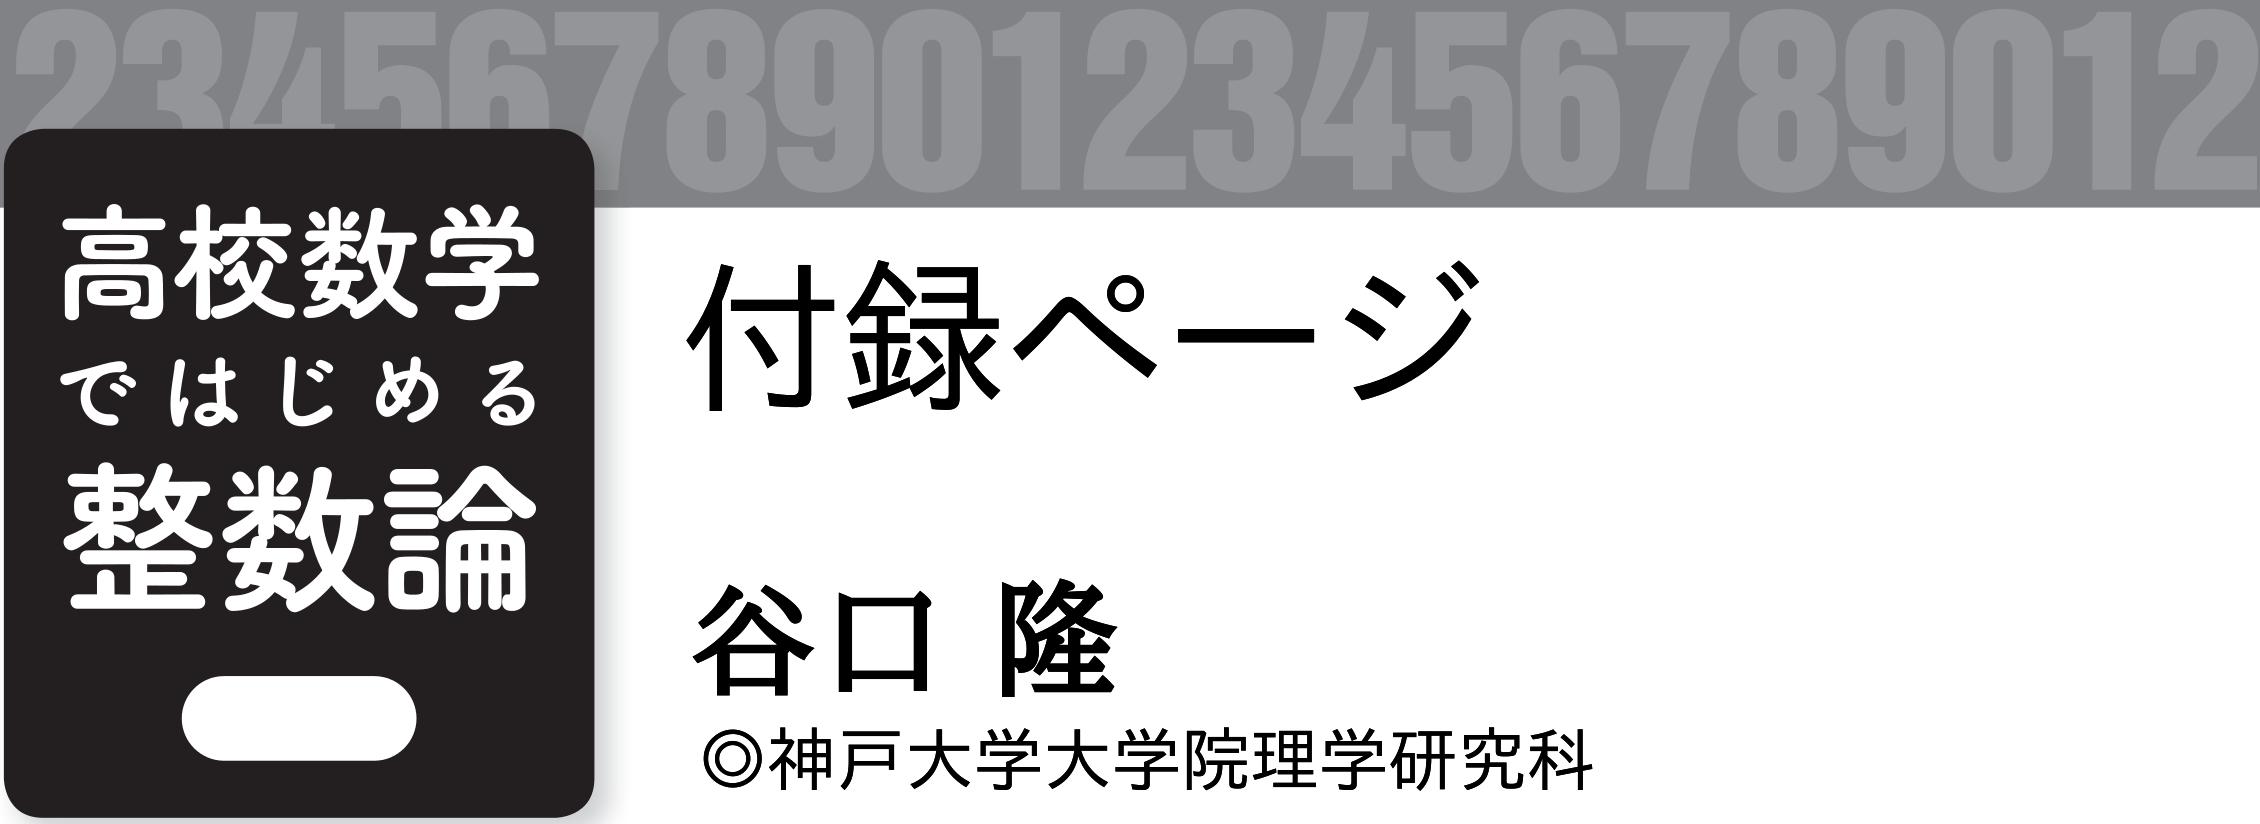 taniguchi-logo